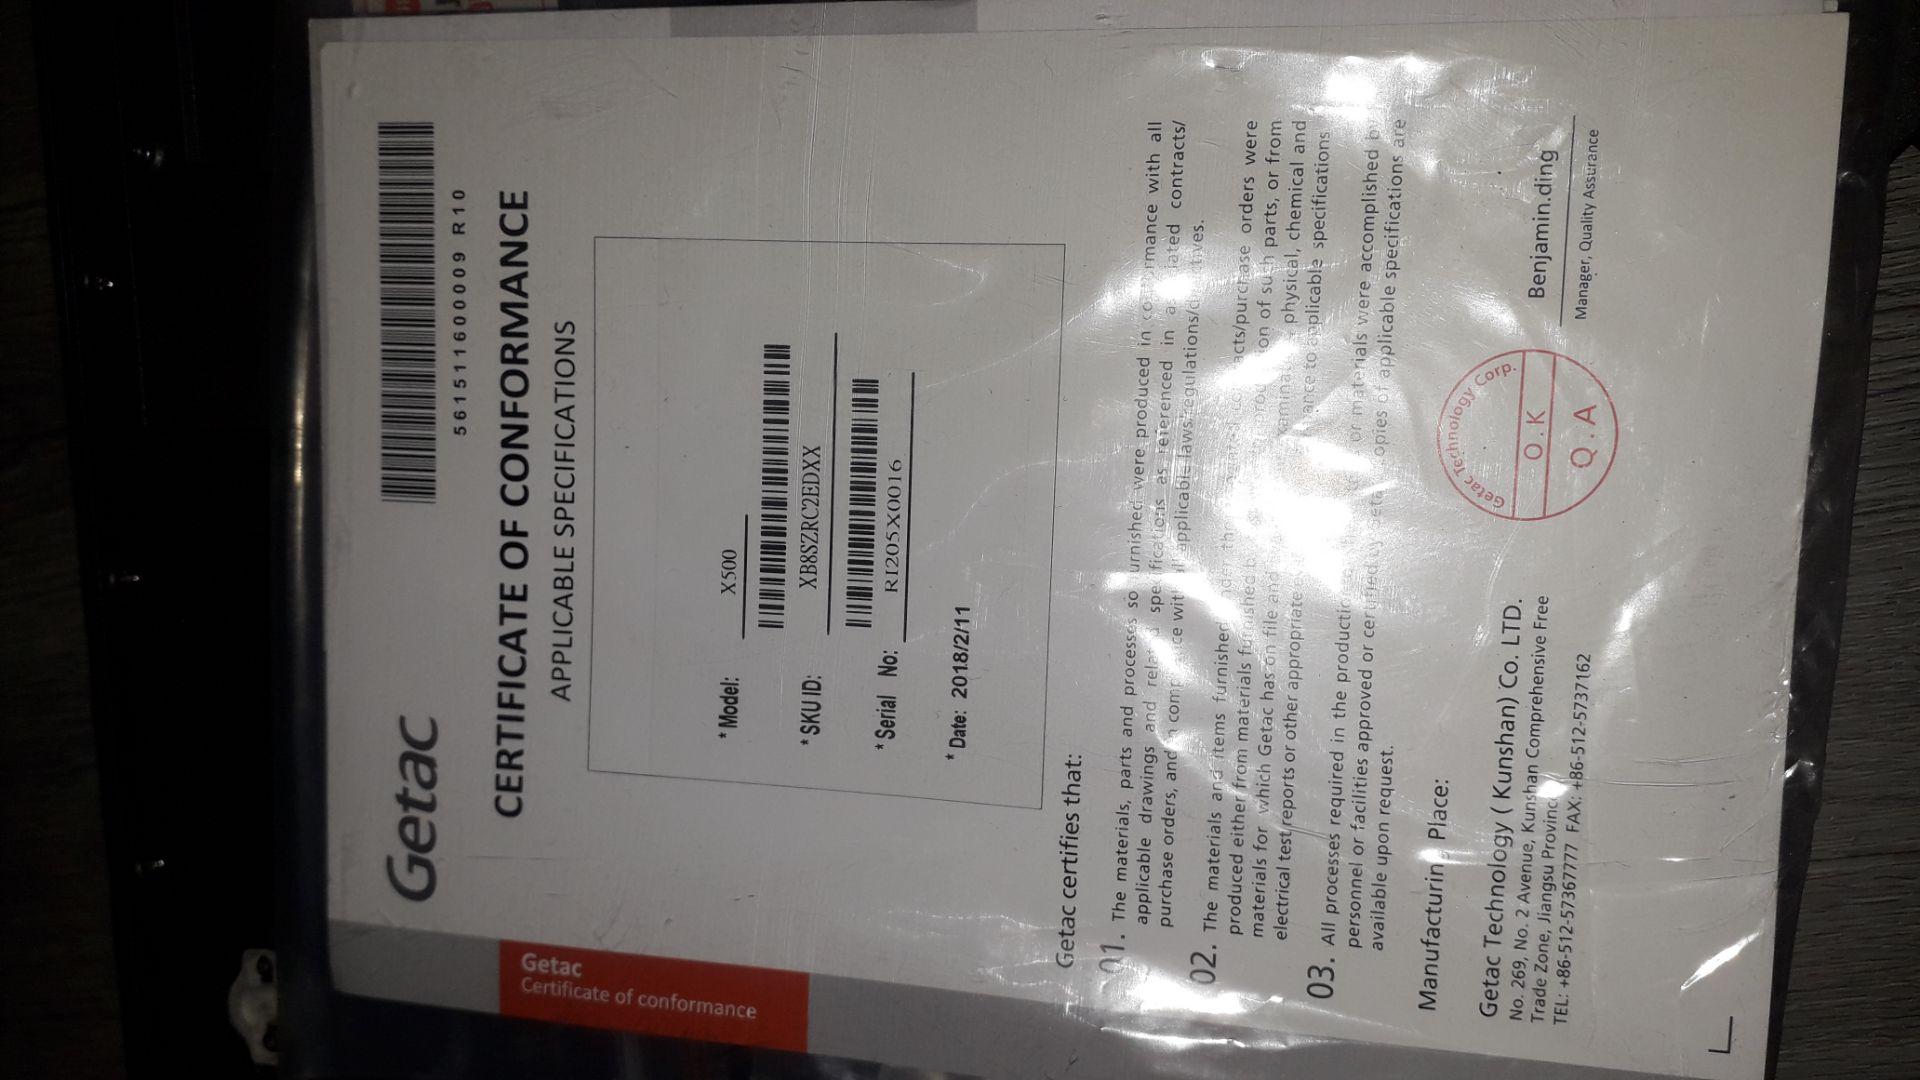 Getac X500 G2 Core i7 8GB, 256GB HDD Ultra Rugged - Image 6 of 9